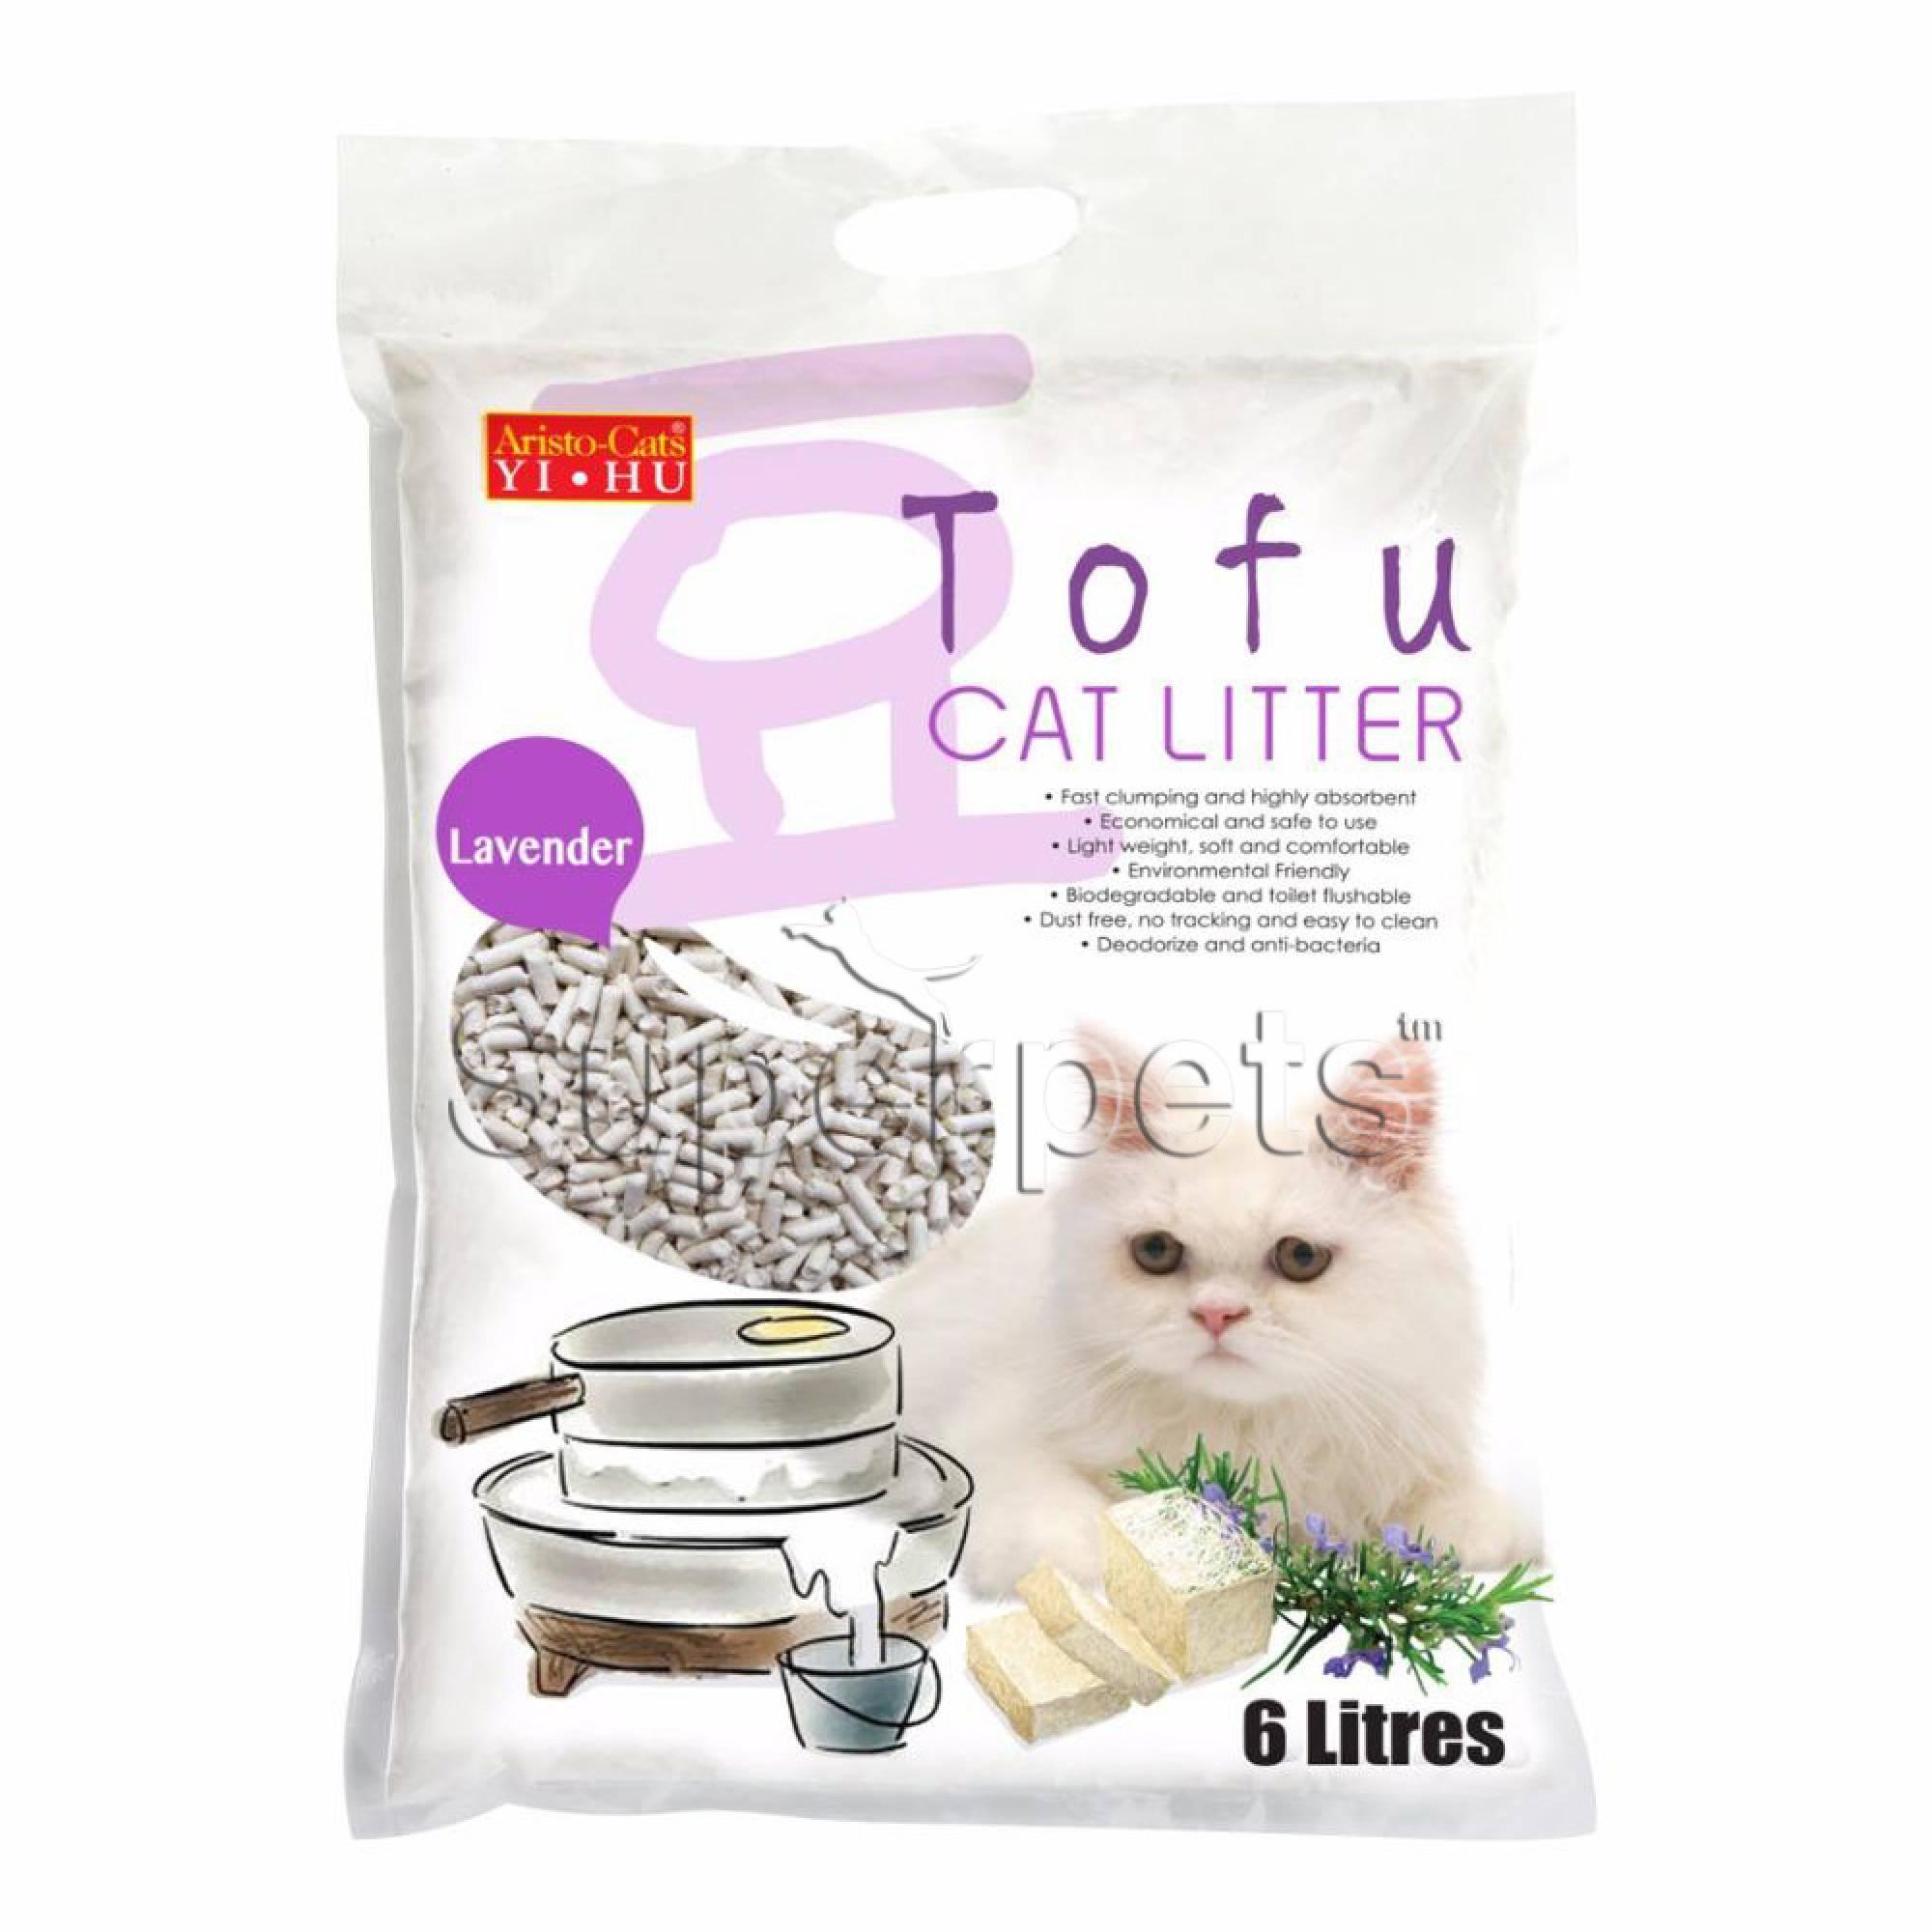 Aristo-Cats - Tofu Cat Litter - Lavender 6L